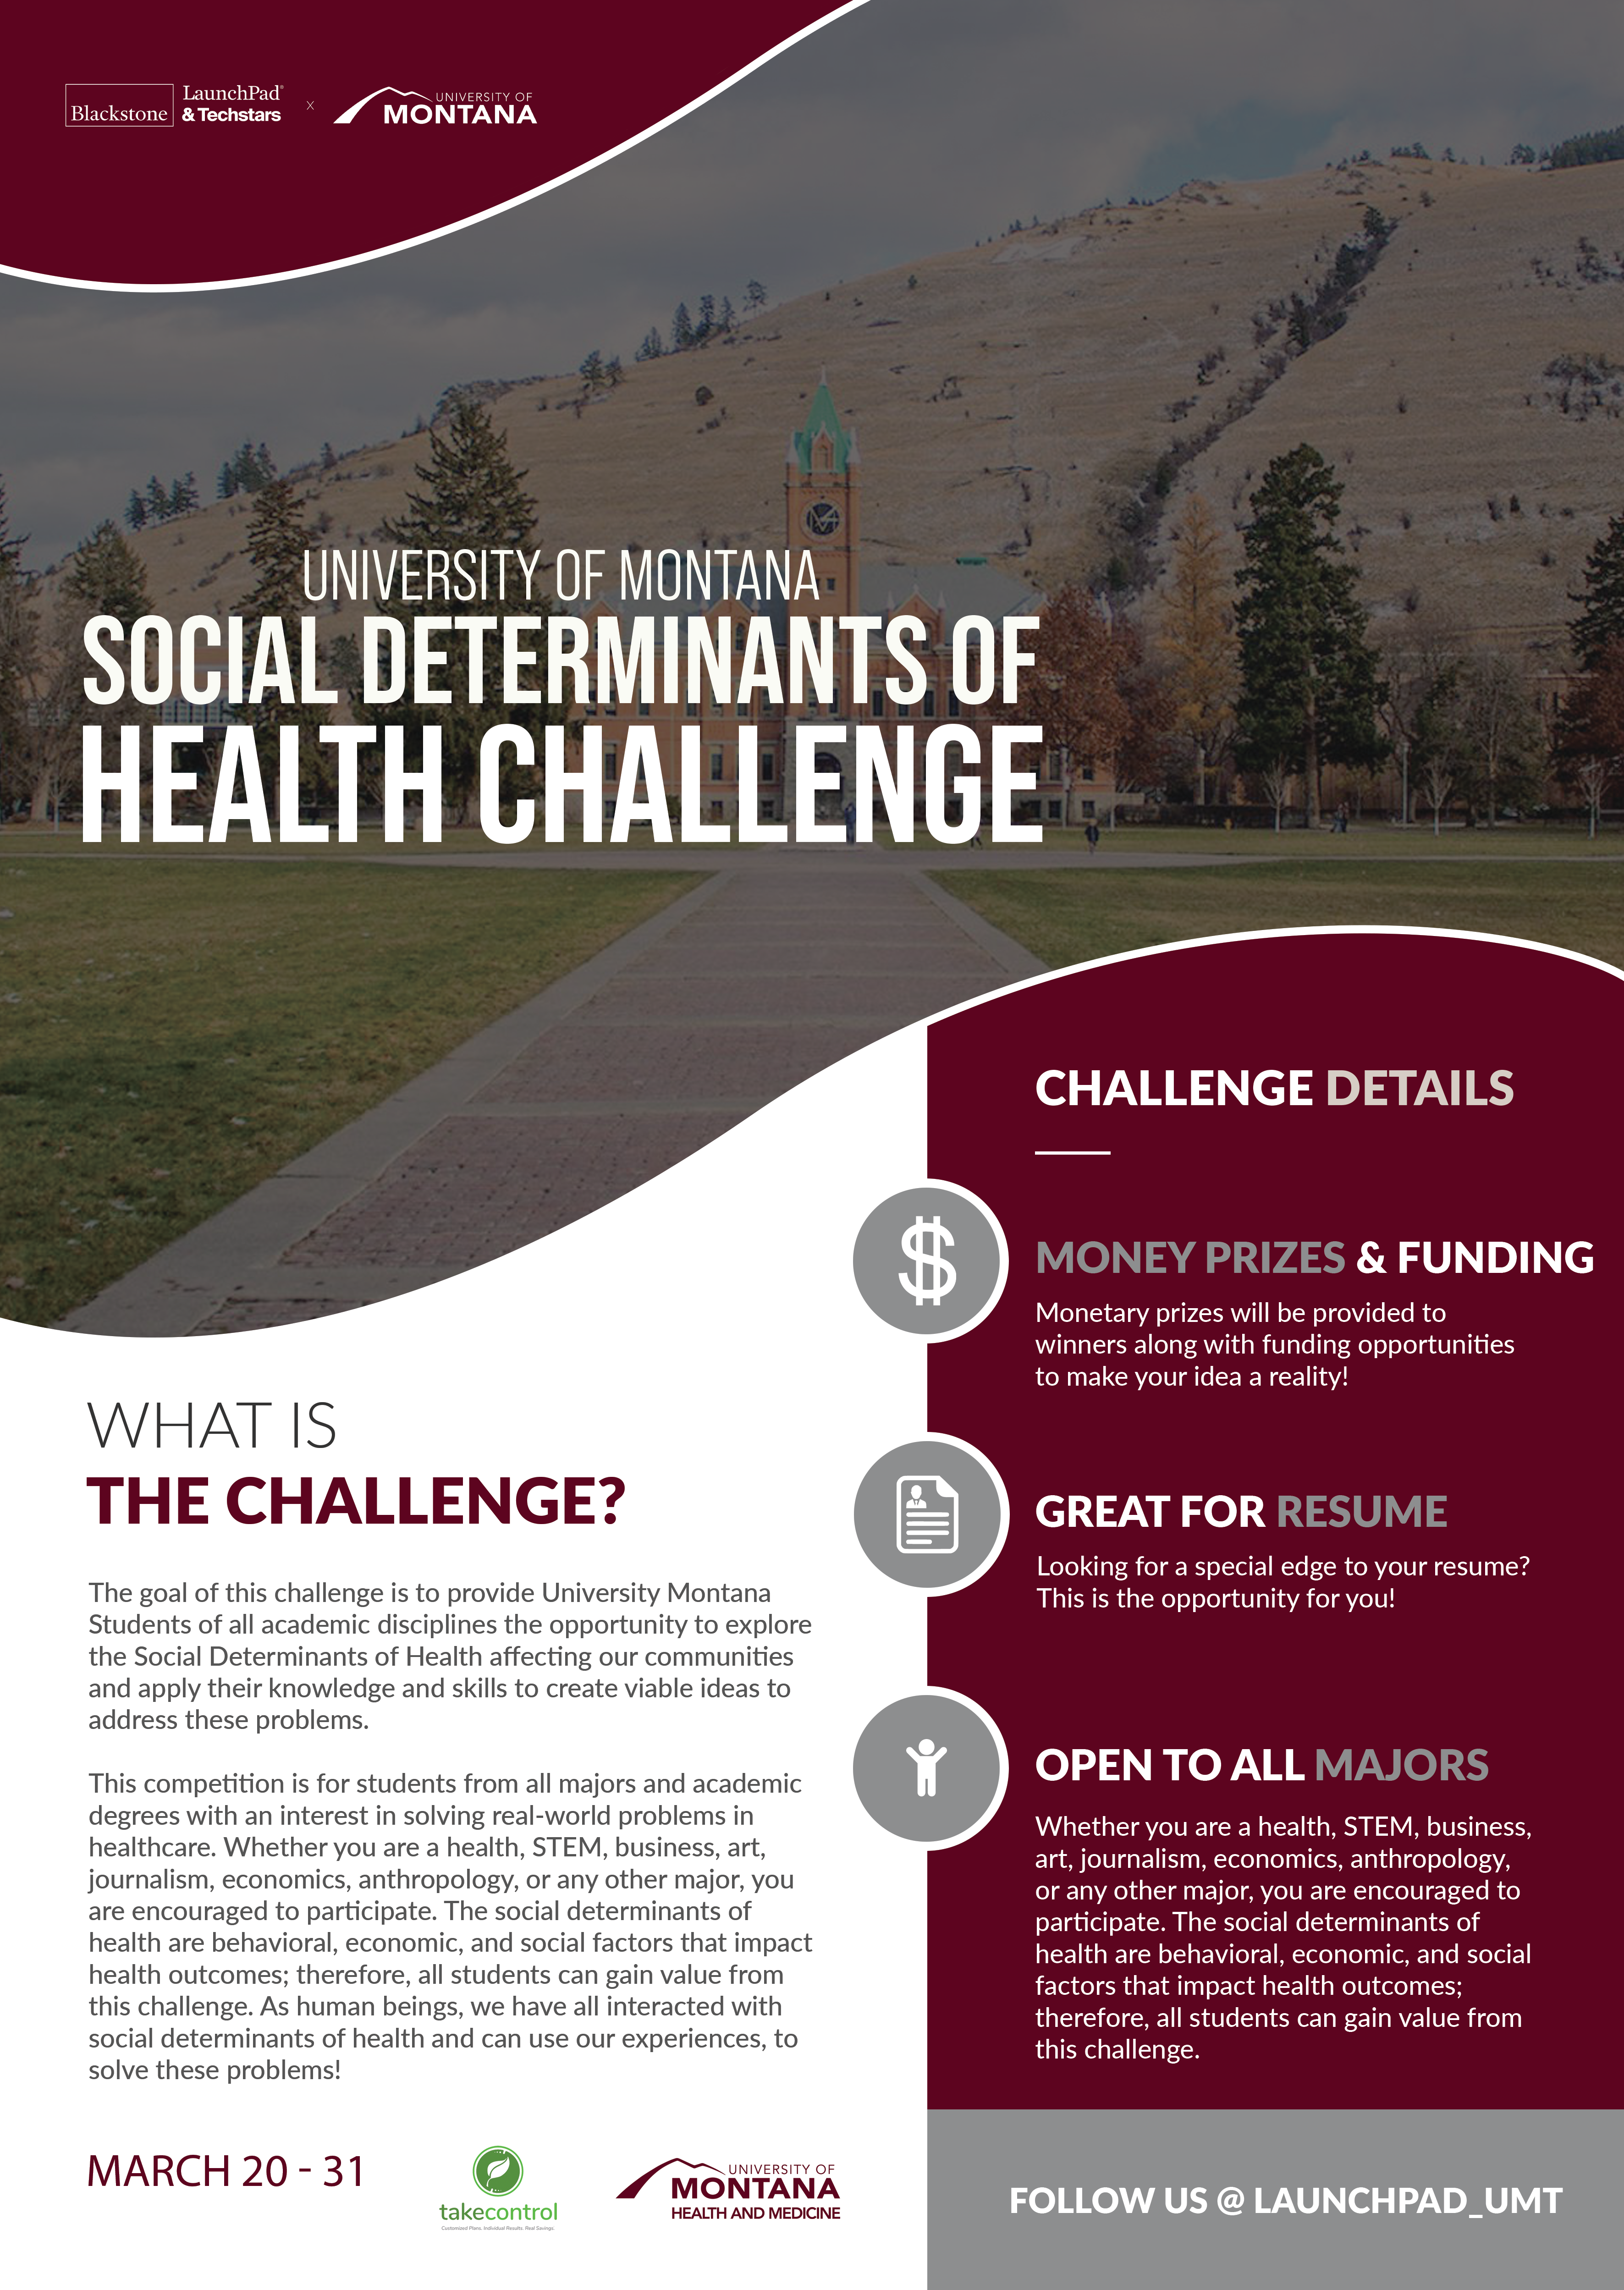 University of Montana Social Determinants of Health Challenge